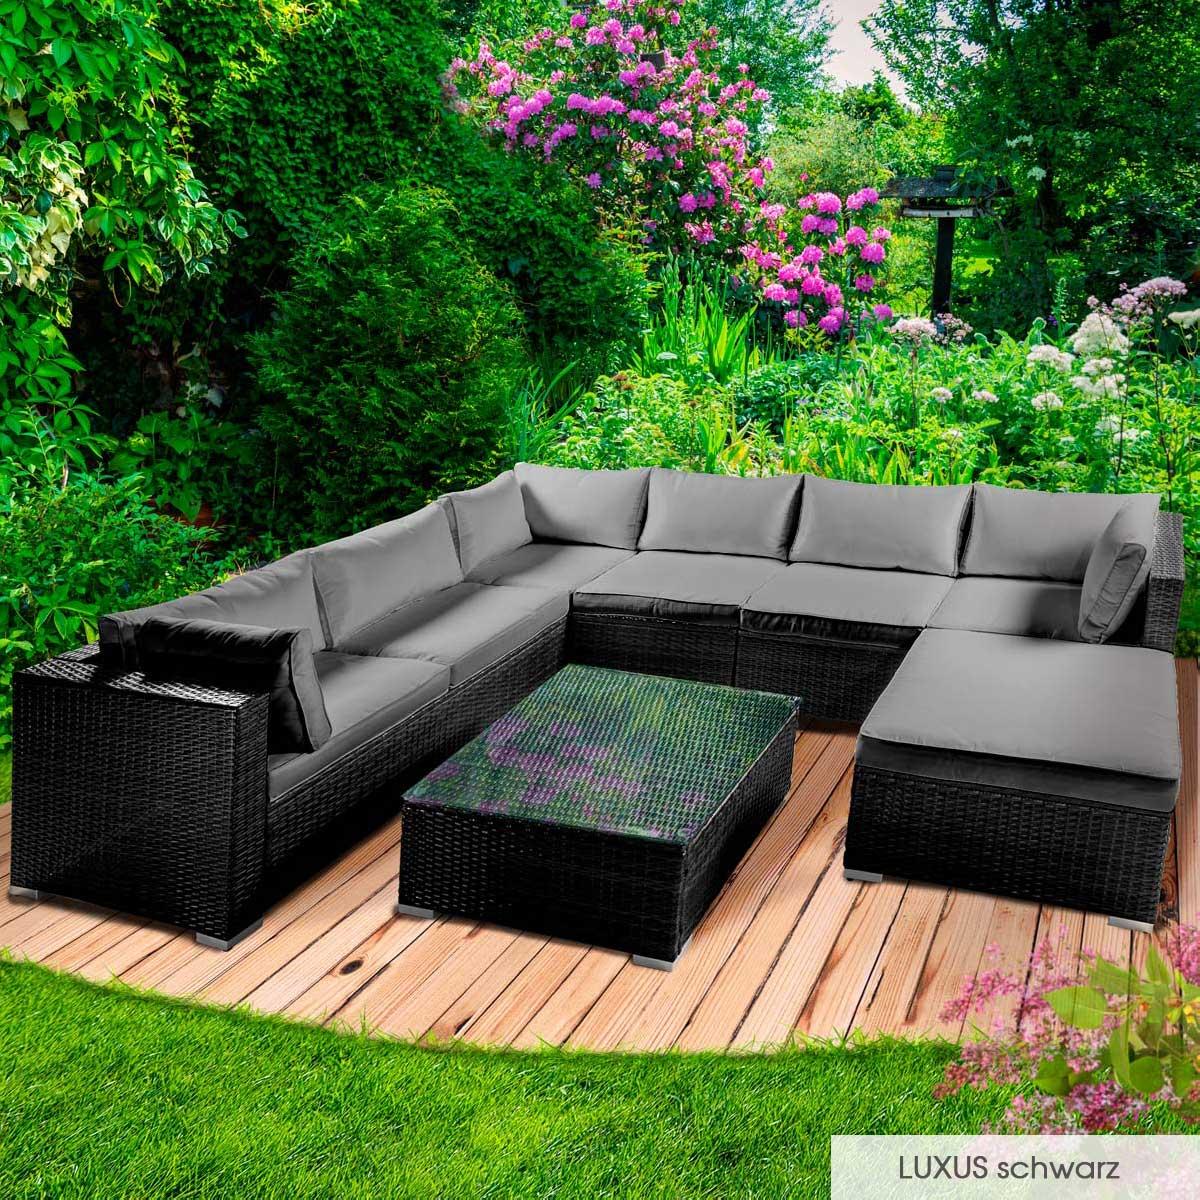 Gartenmoebel-Poly-Rattan-Lounge-Moebel-Sitzgarnitur-Gartengarnitur-Sitzgruppe-Sofa Indexbild 34